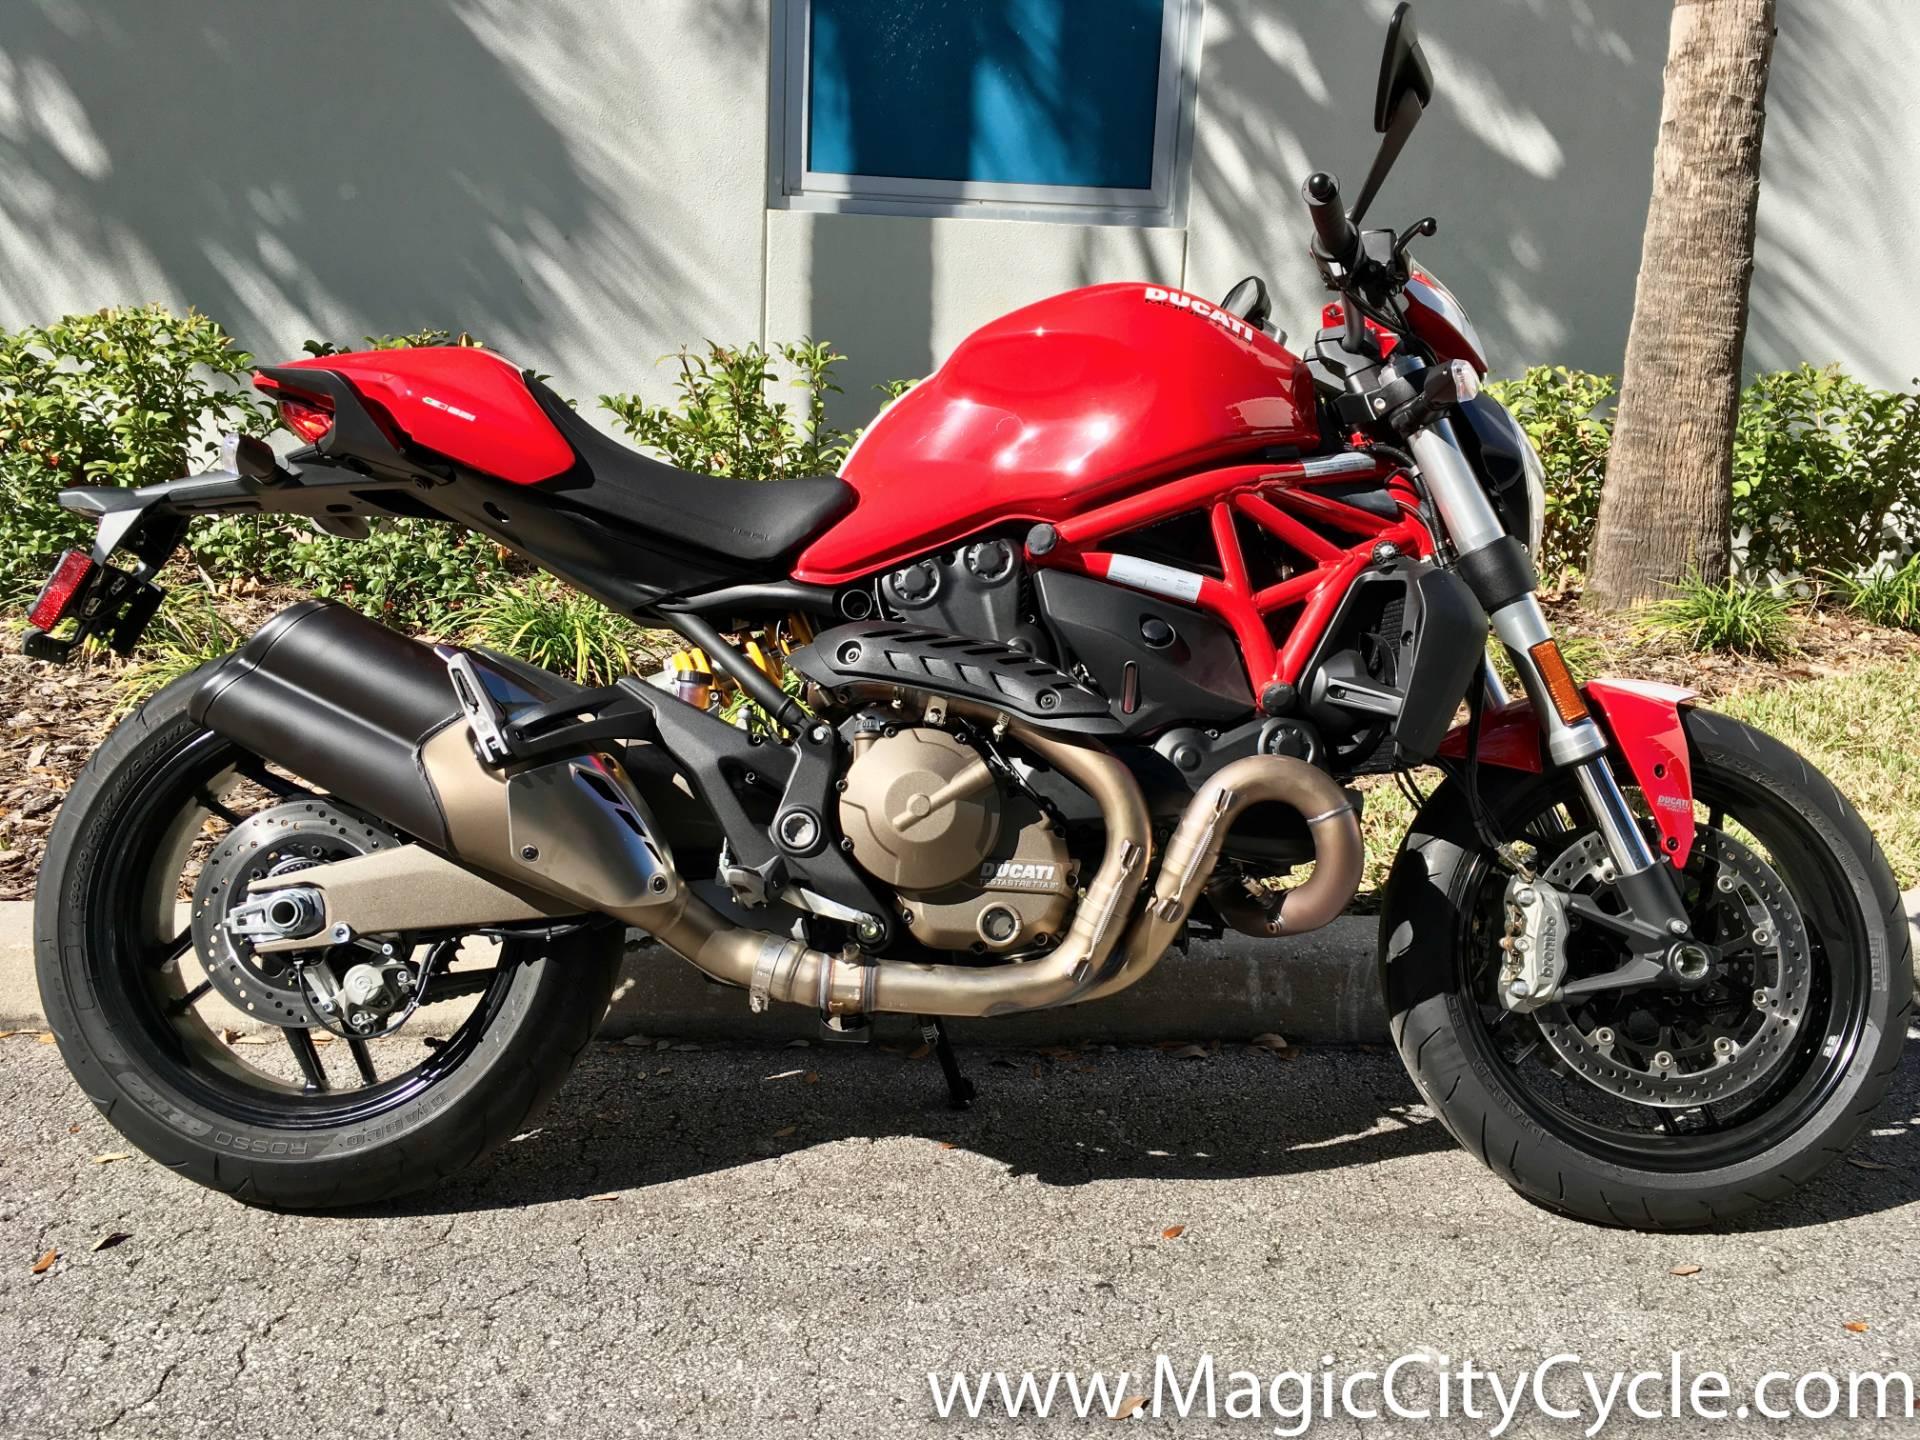 2016 ducati monster 821 motorcycles orlando florida 019408